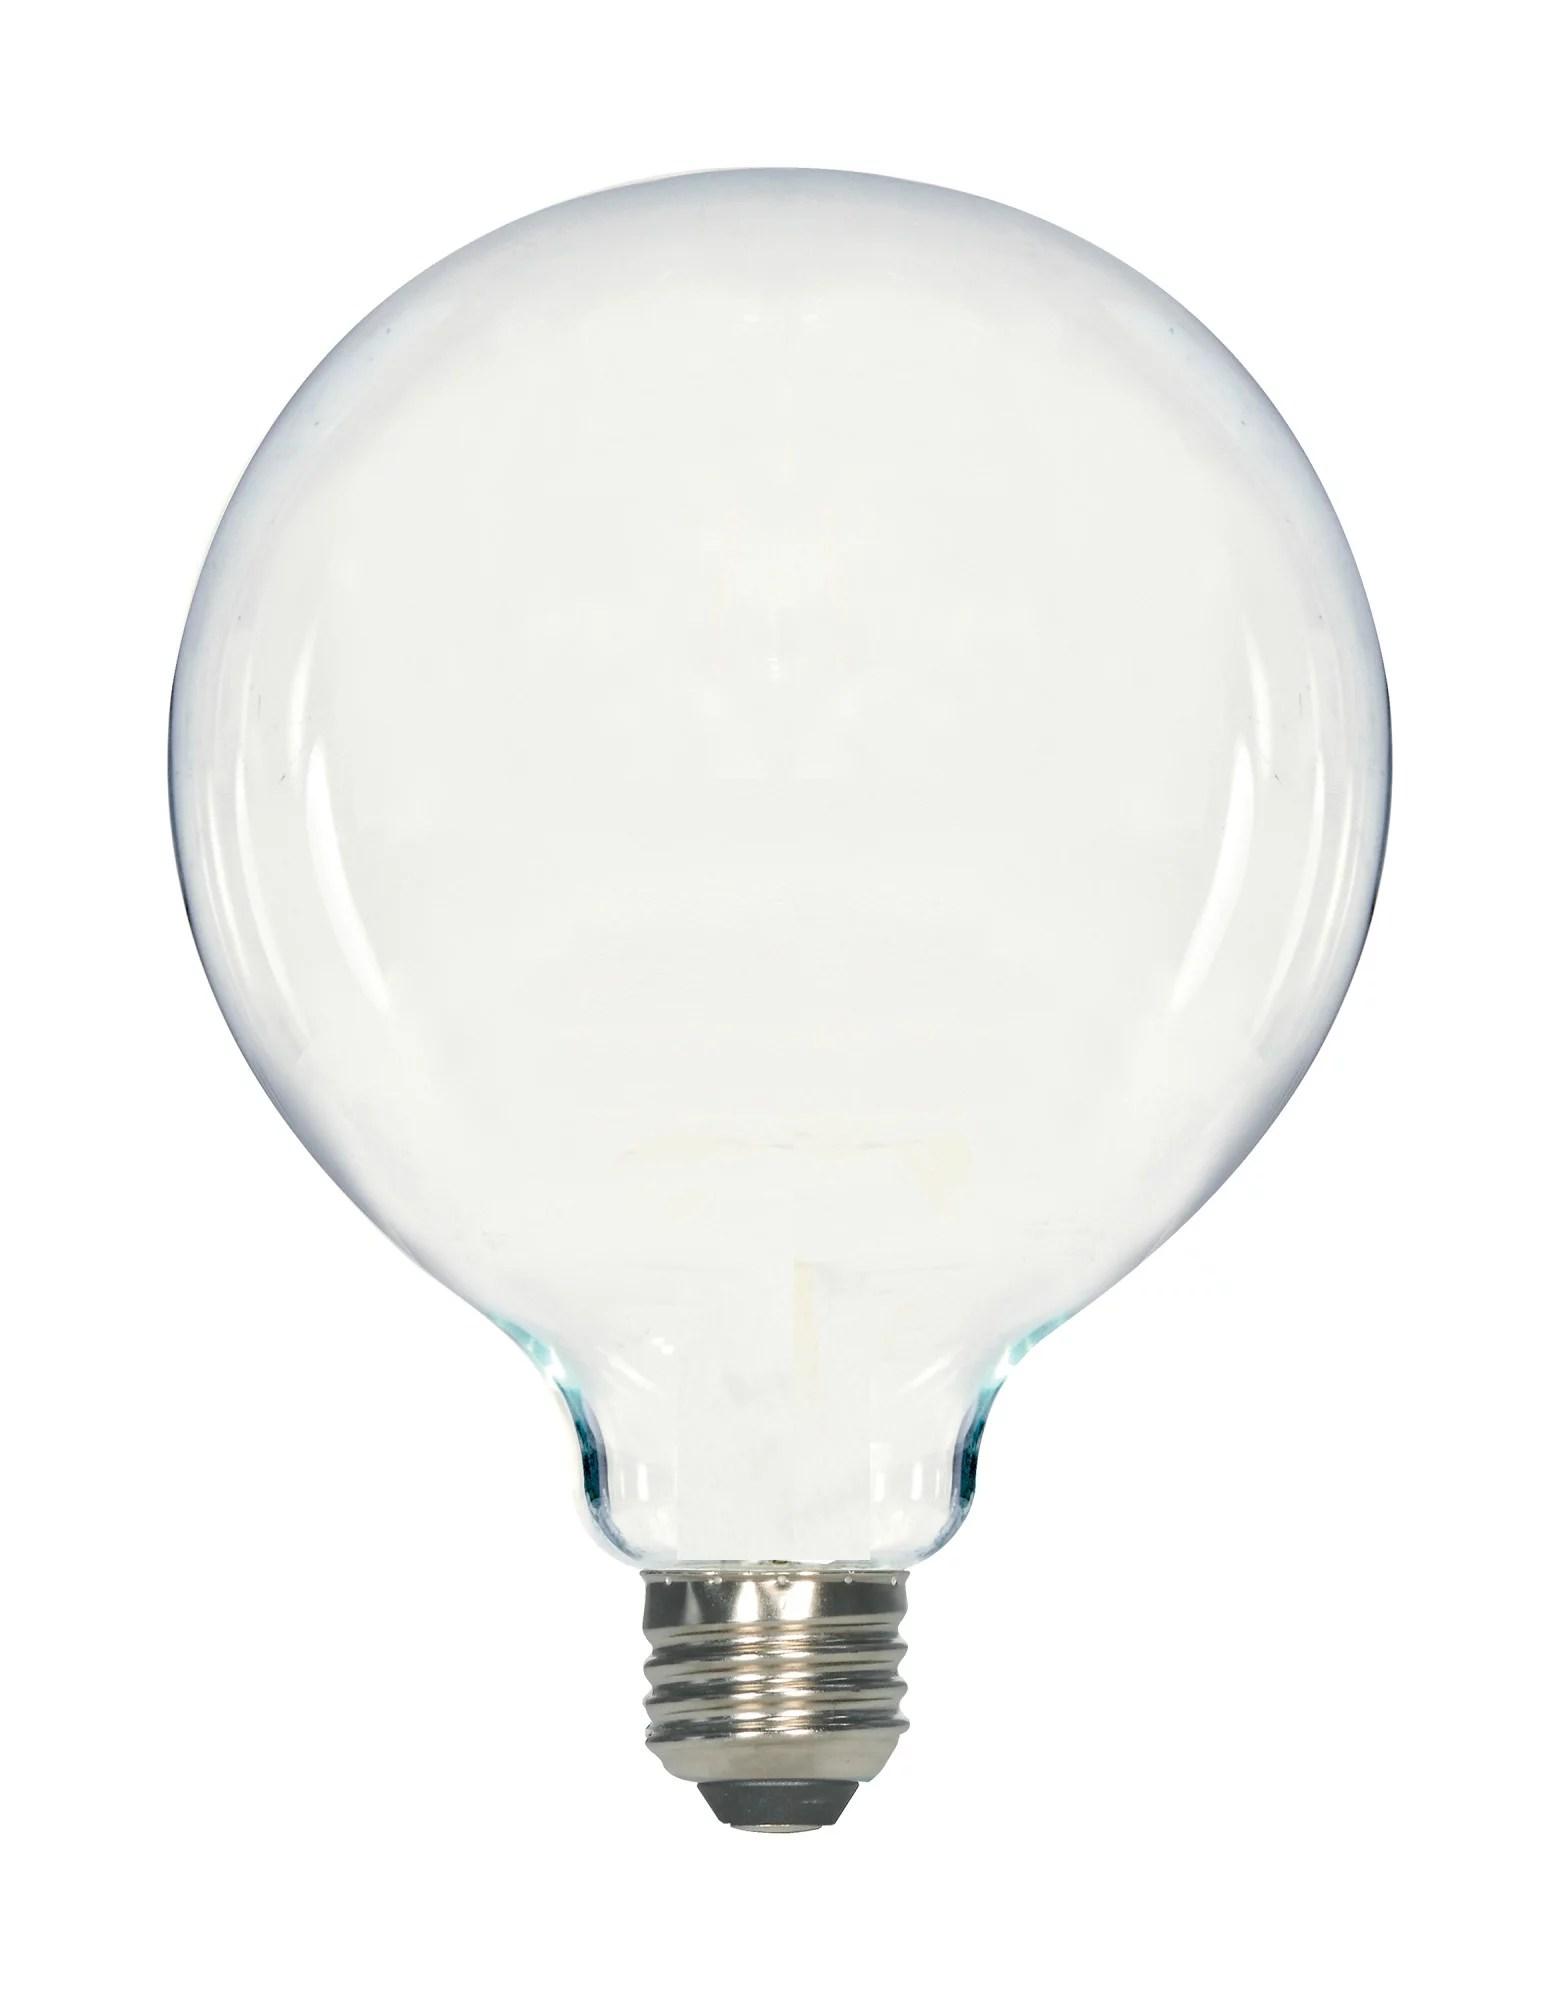 satco lighting s12112 6 5 watt g40 led soft white medium base 2700k 650 lumens 120 volts